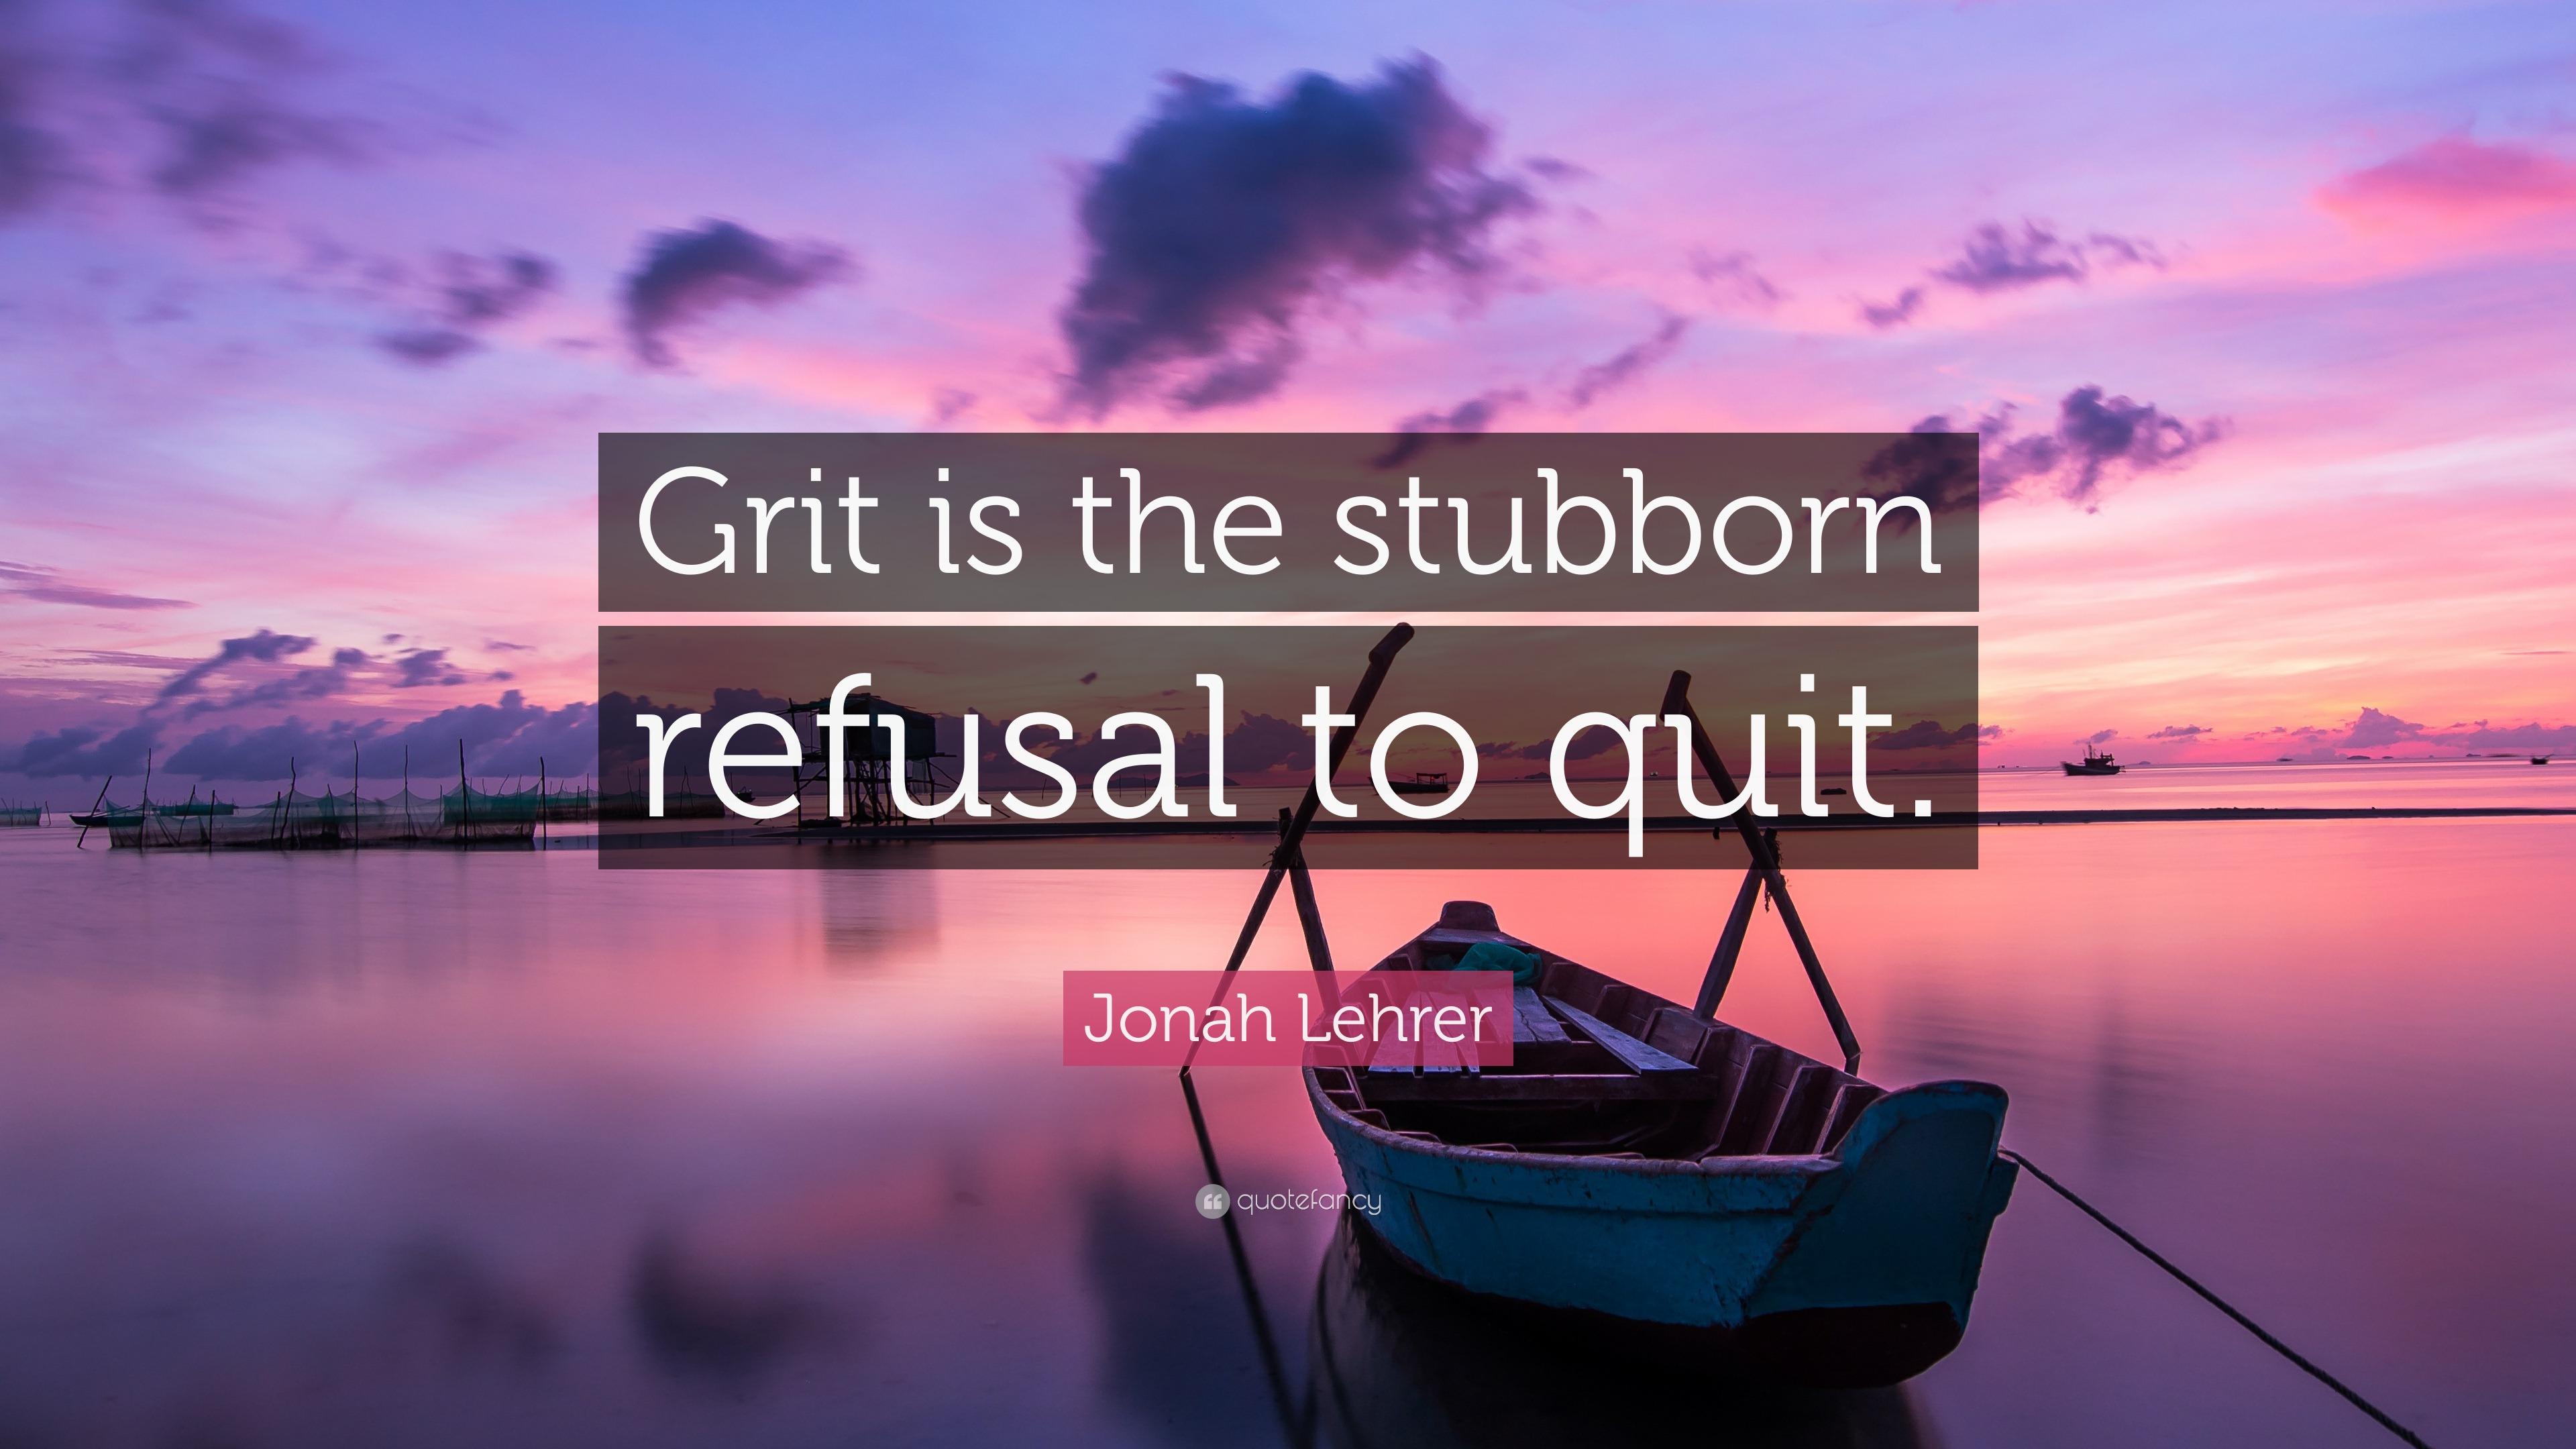 Jonah lehrer quote grit is the stubborn refusal to quit - Quit wallpaper ...